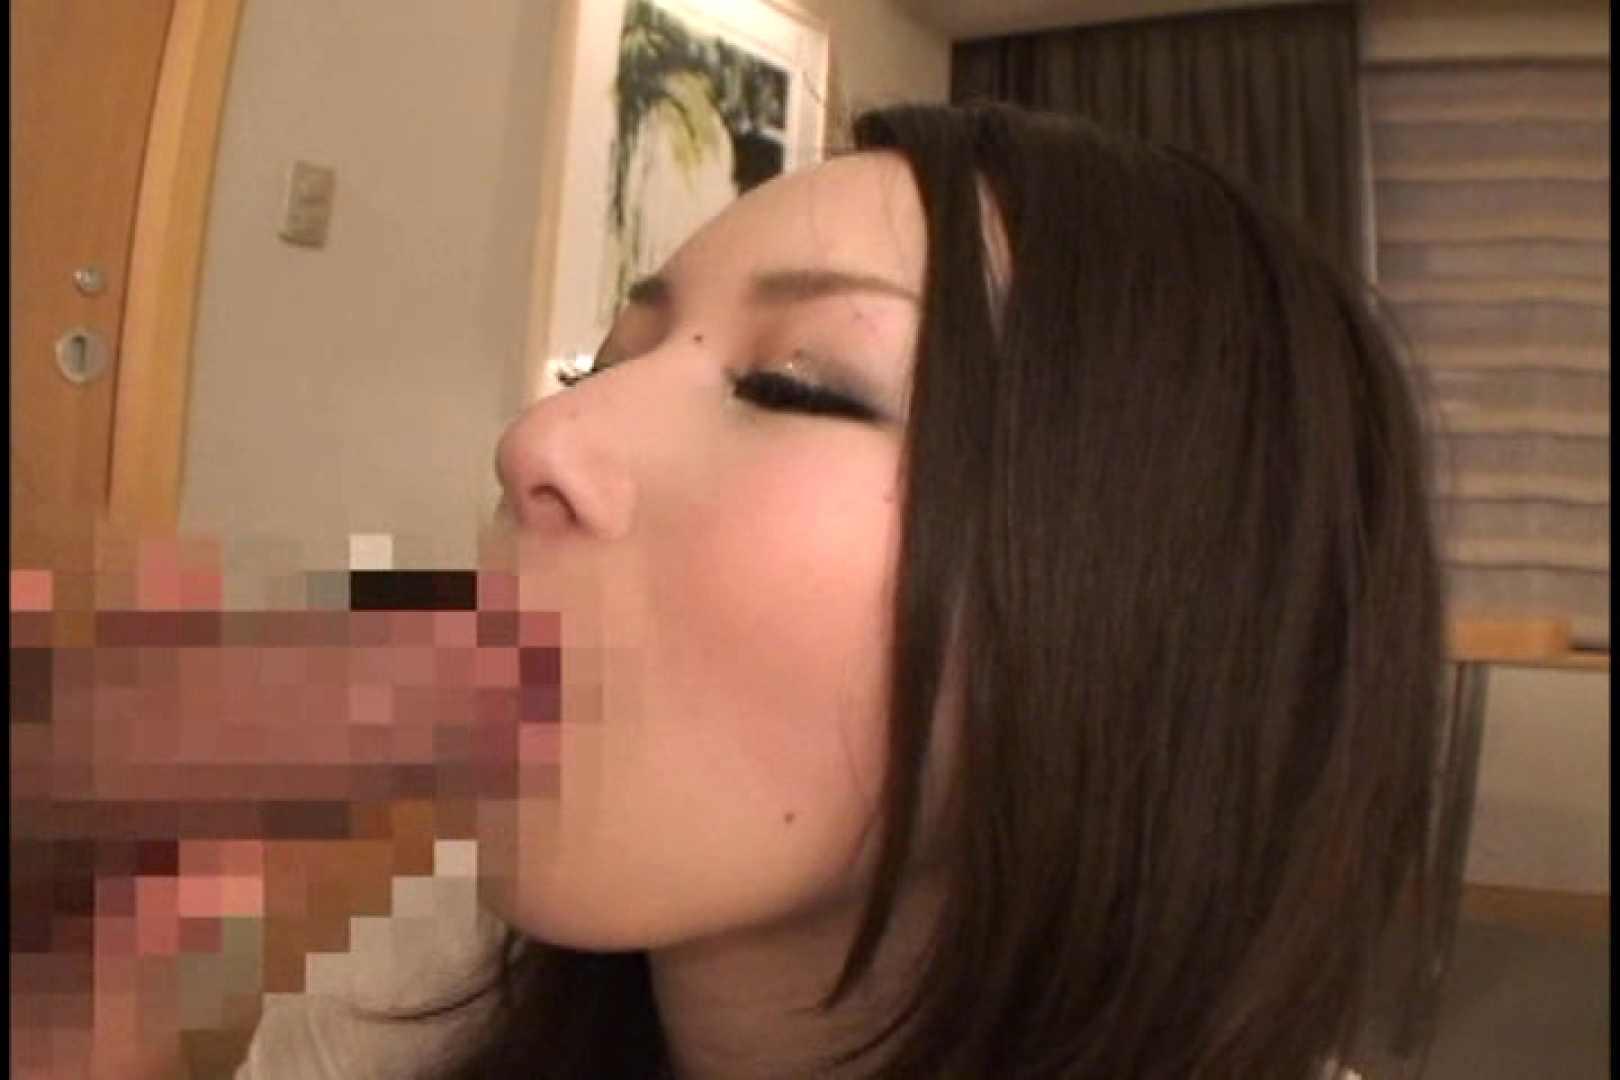 JDハンター全国ツアー vol.045 後編 女子大生のエロ動画  91PIX 32